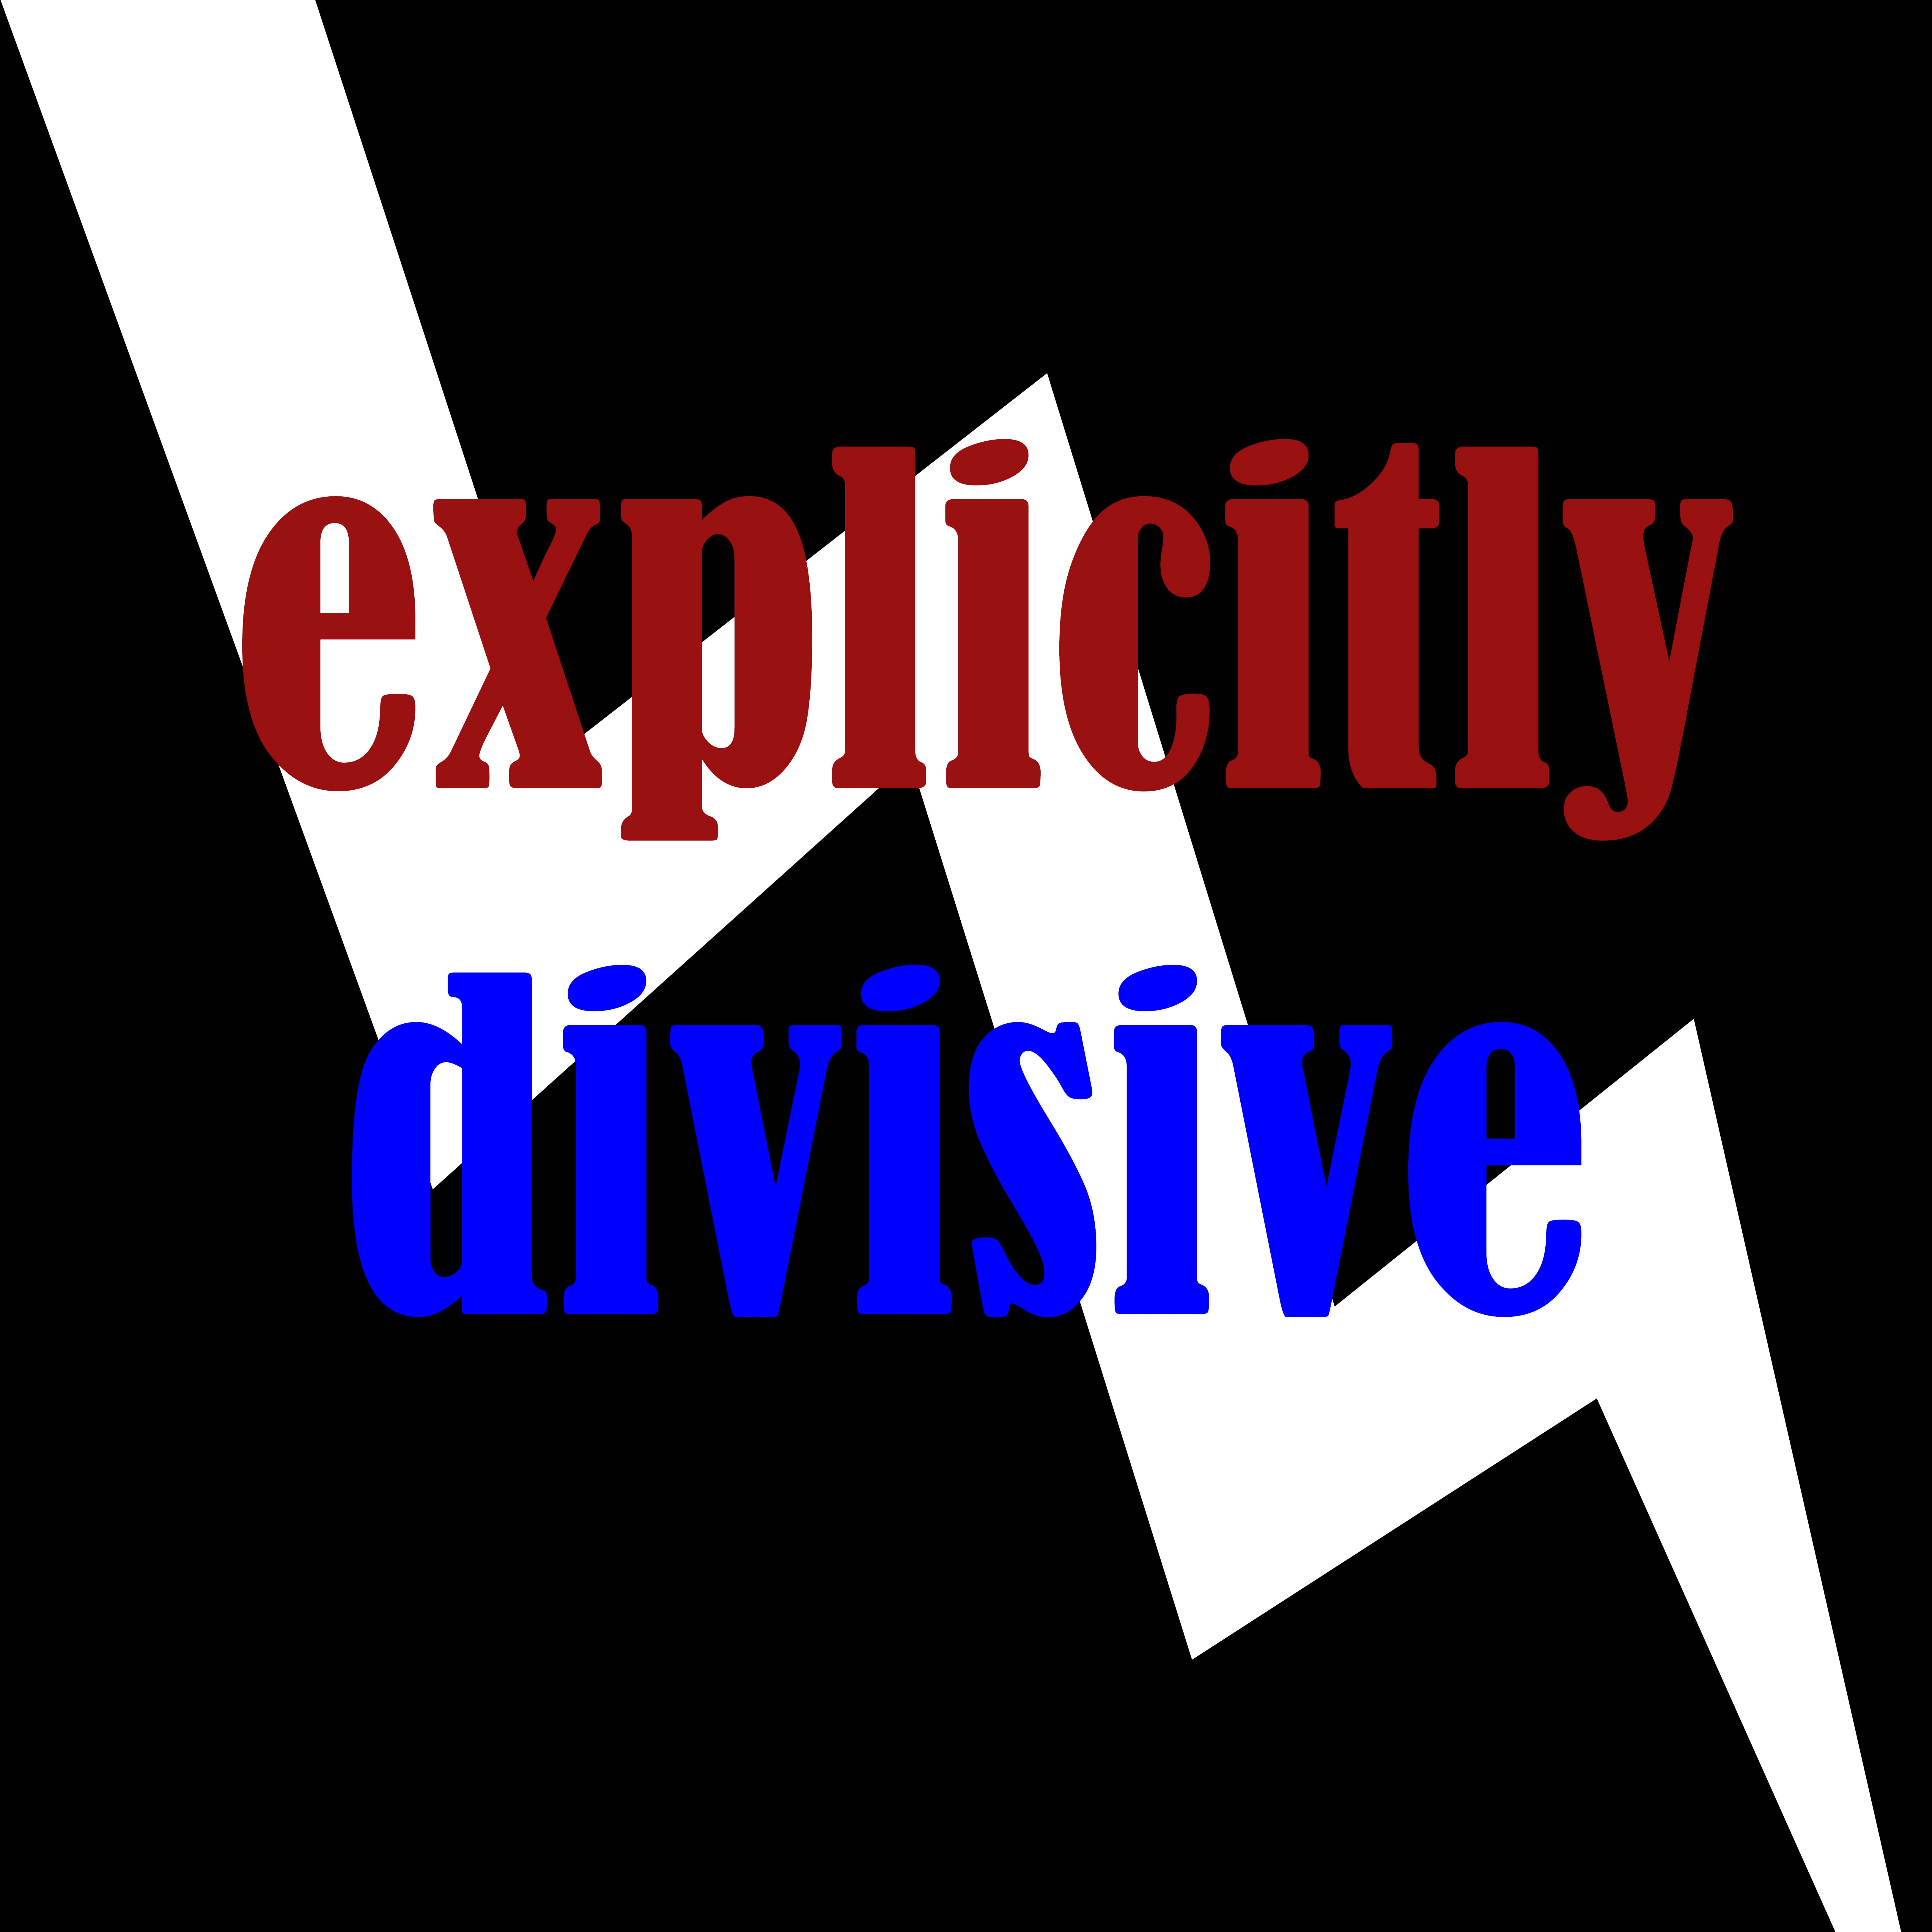 explicitly divisive copy